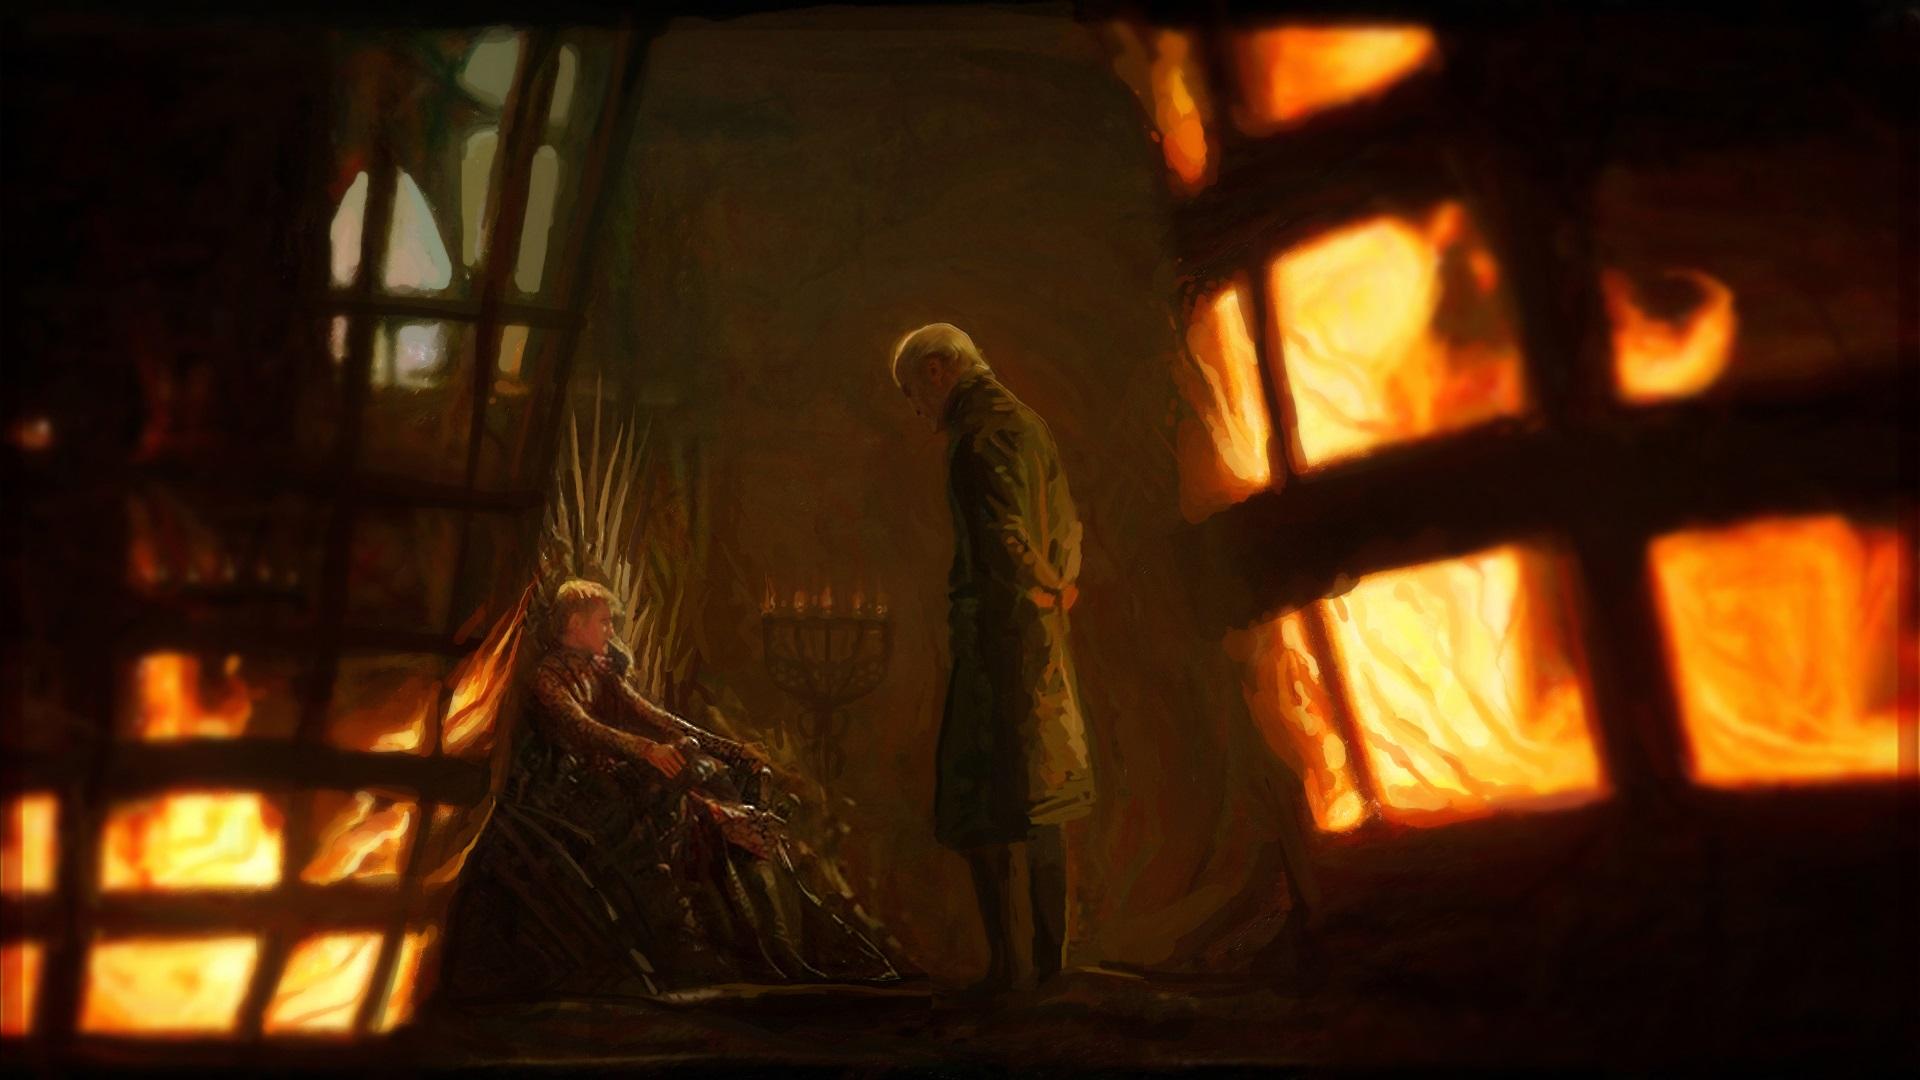 General 1920x1080 Tywin Lannister Joffrey Baratheon Game of Thrones artwork fan art fire Iron Throne fantasy art